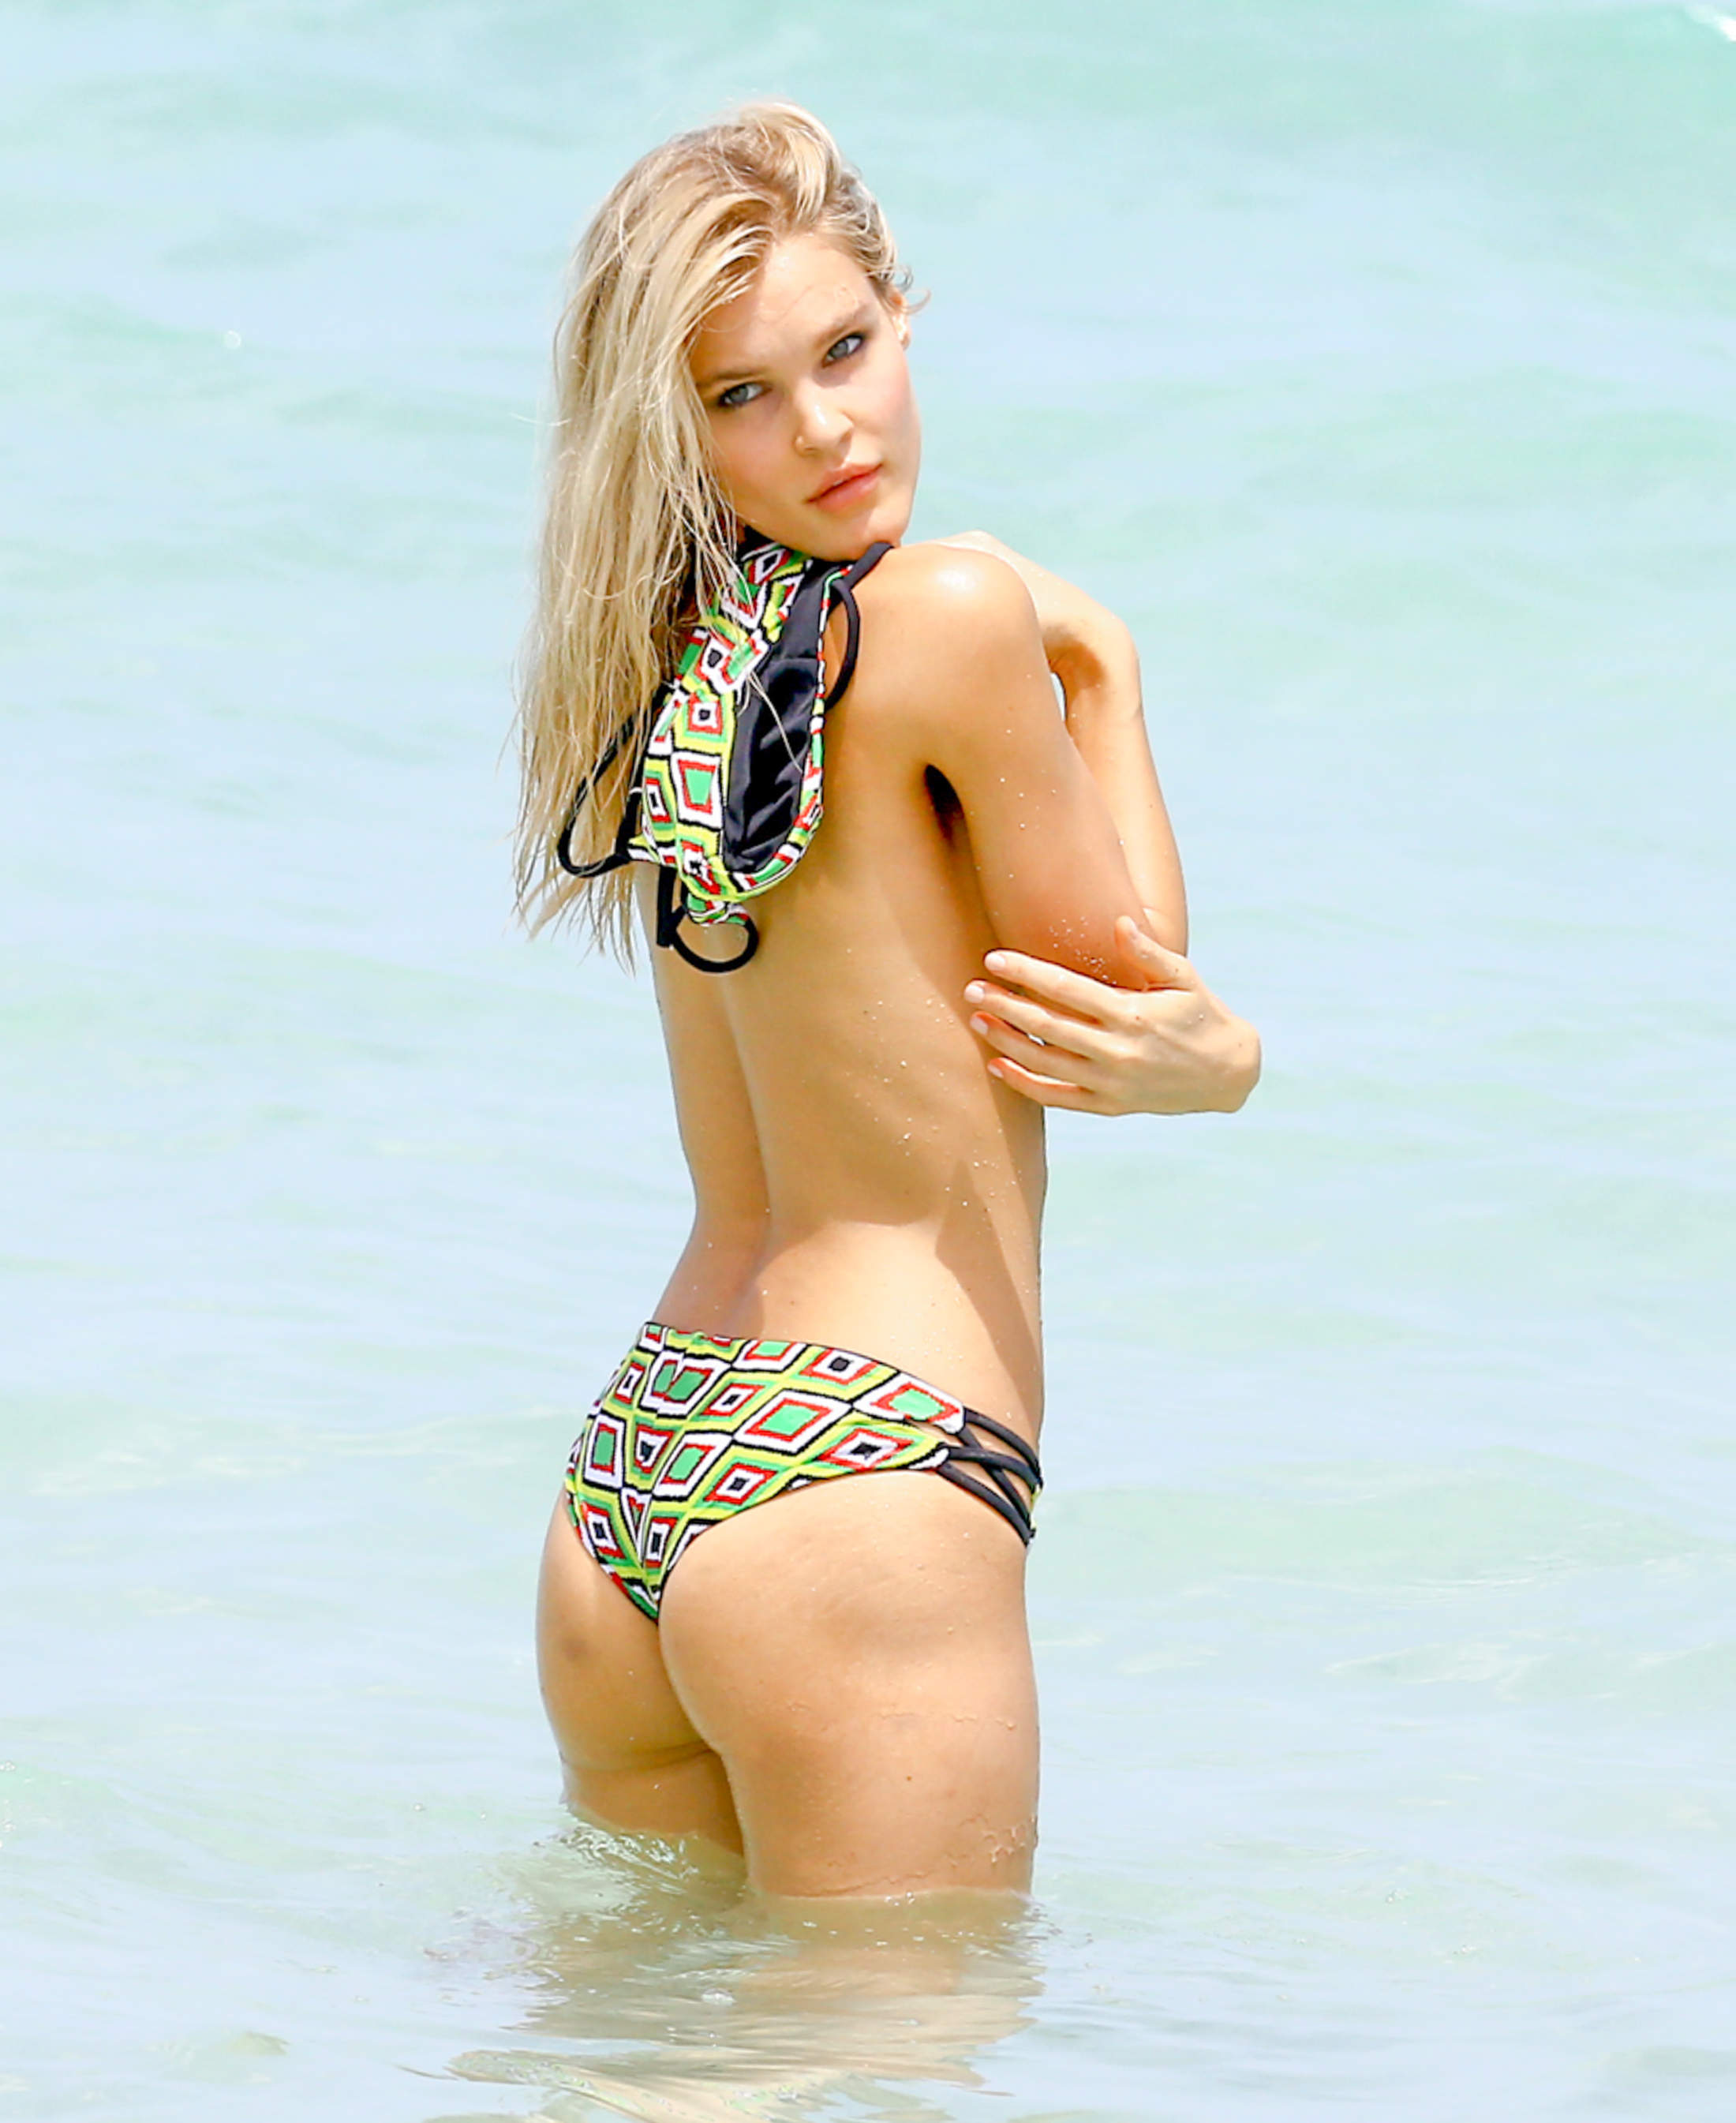 Joy Corrigan Naked joy corrigan shows off her bikini body in miami | 210486